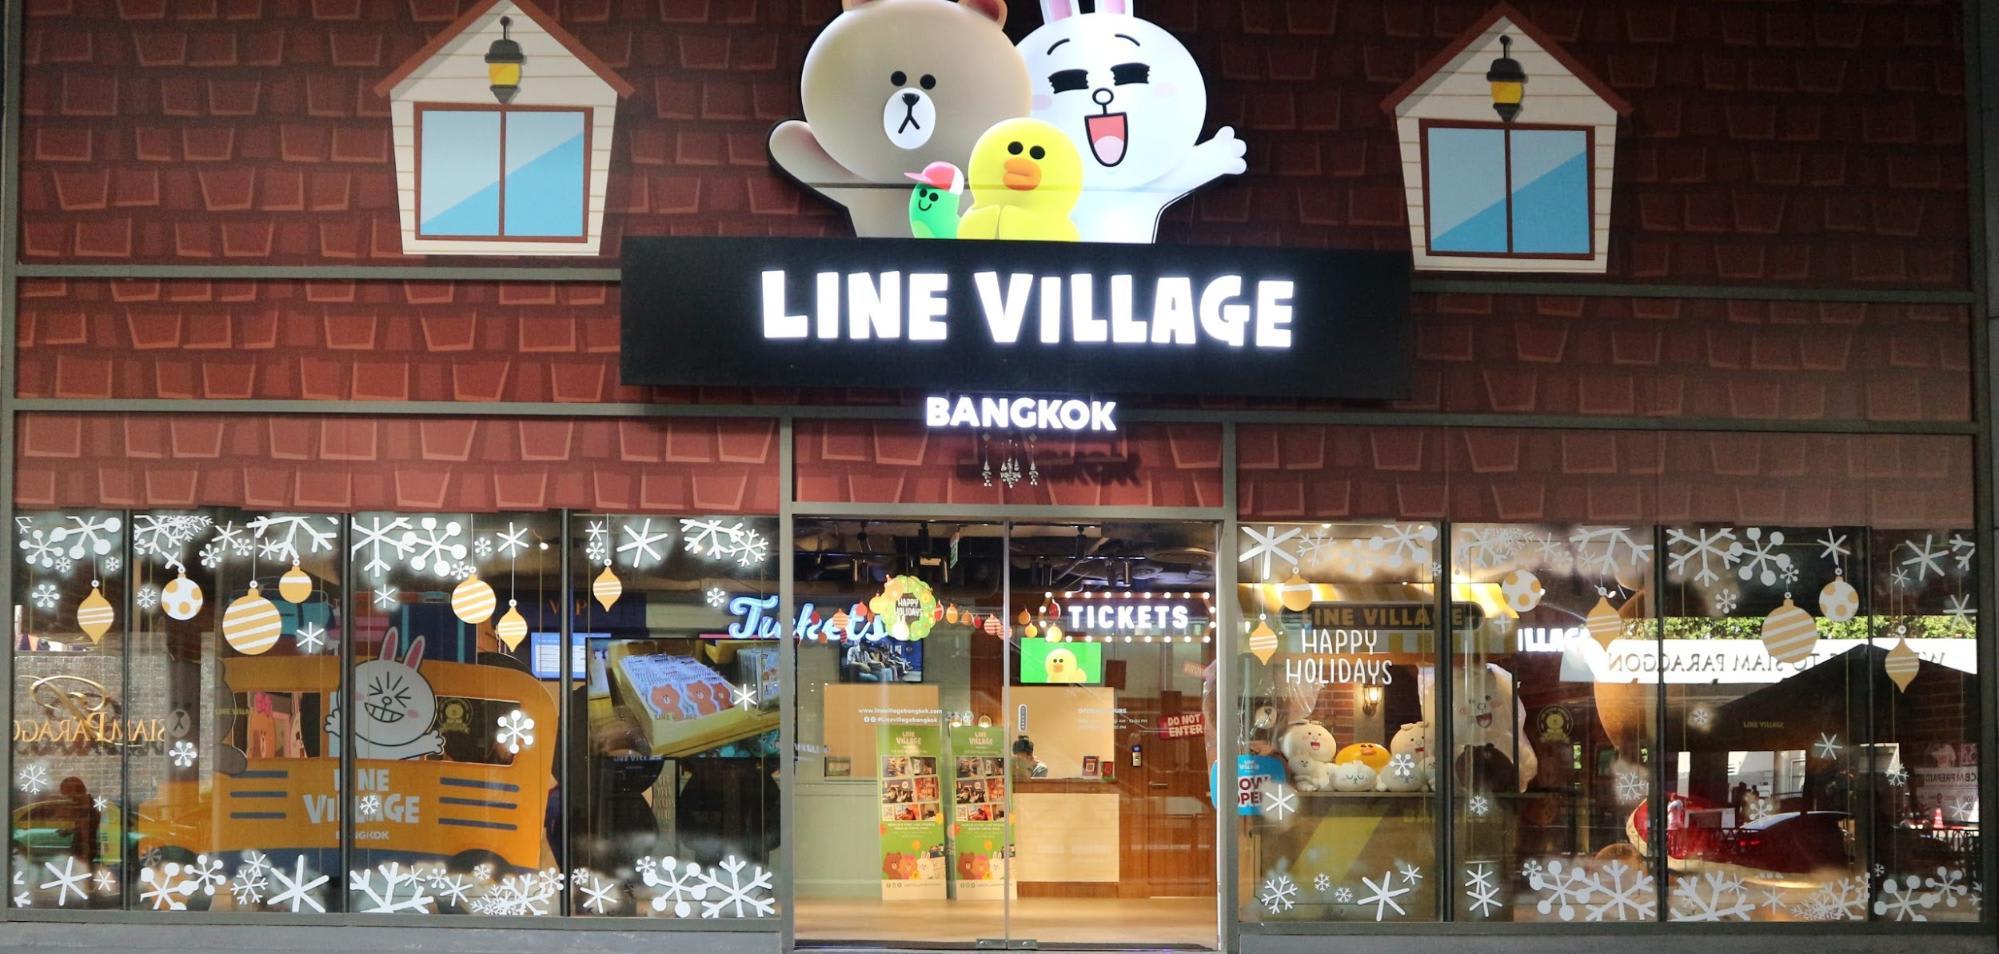 cổng line village bangkok